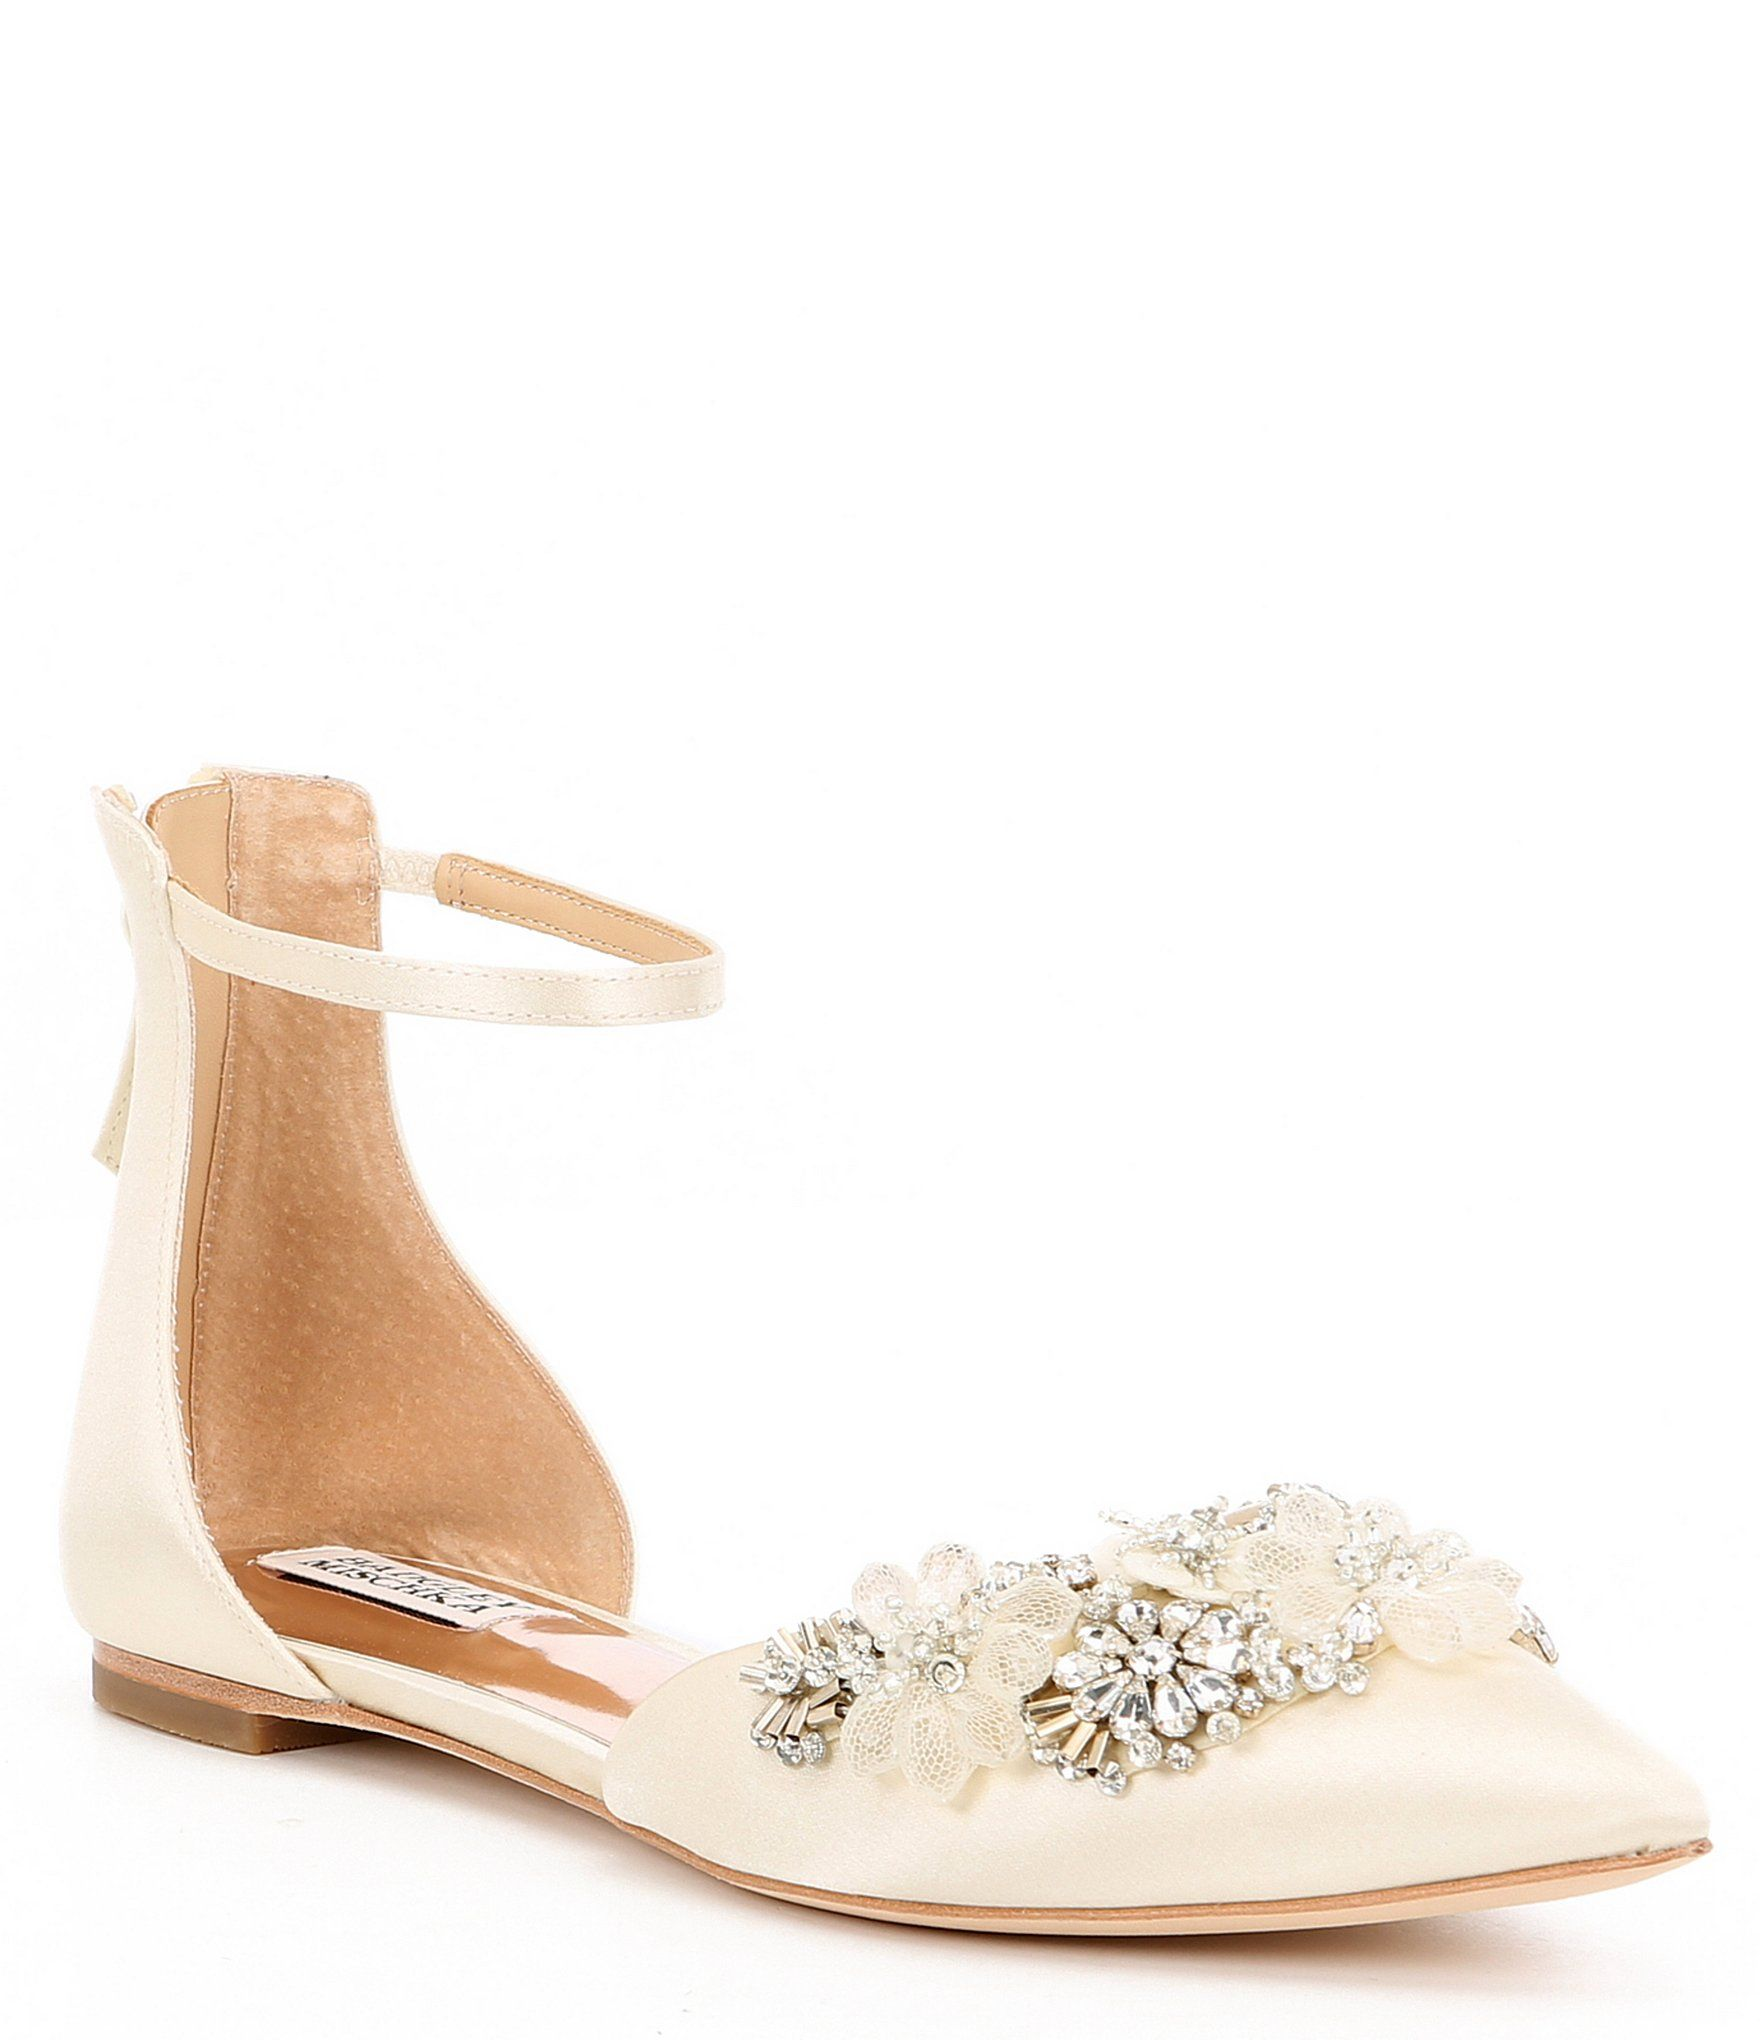 Badgley Mischka Abby Satin Ornament Ankle Strap Flats